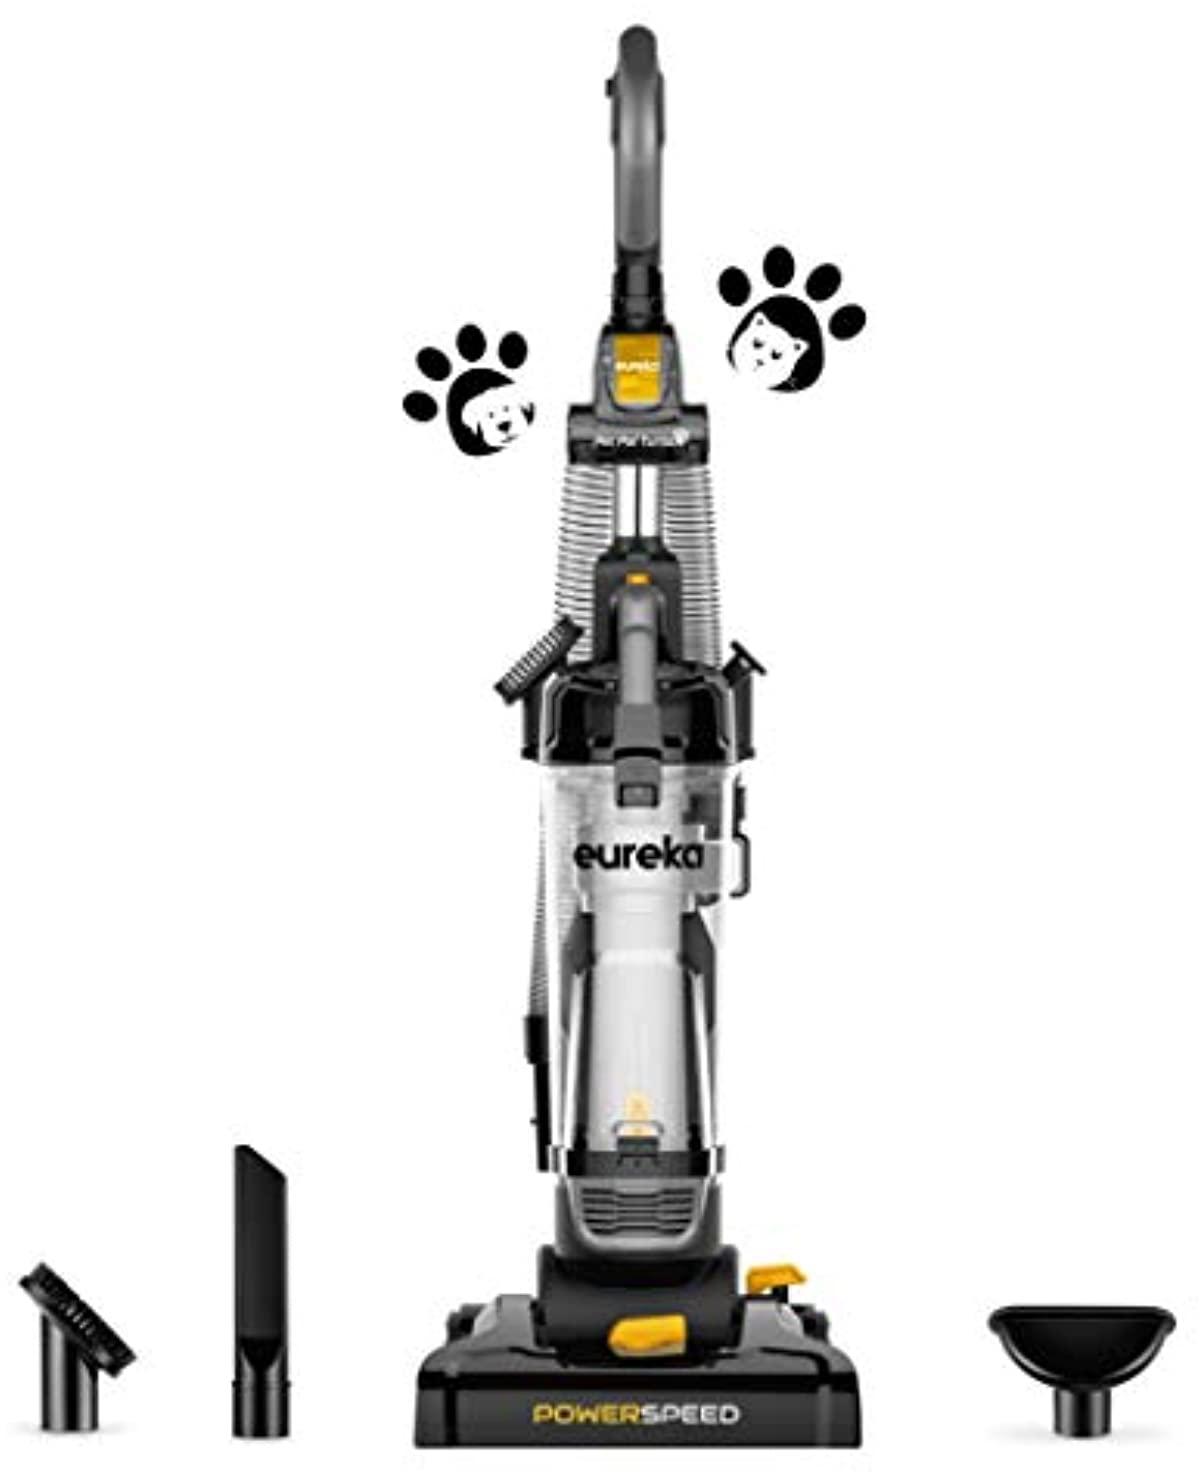 Bagless upright vacuum cleaner